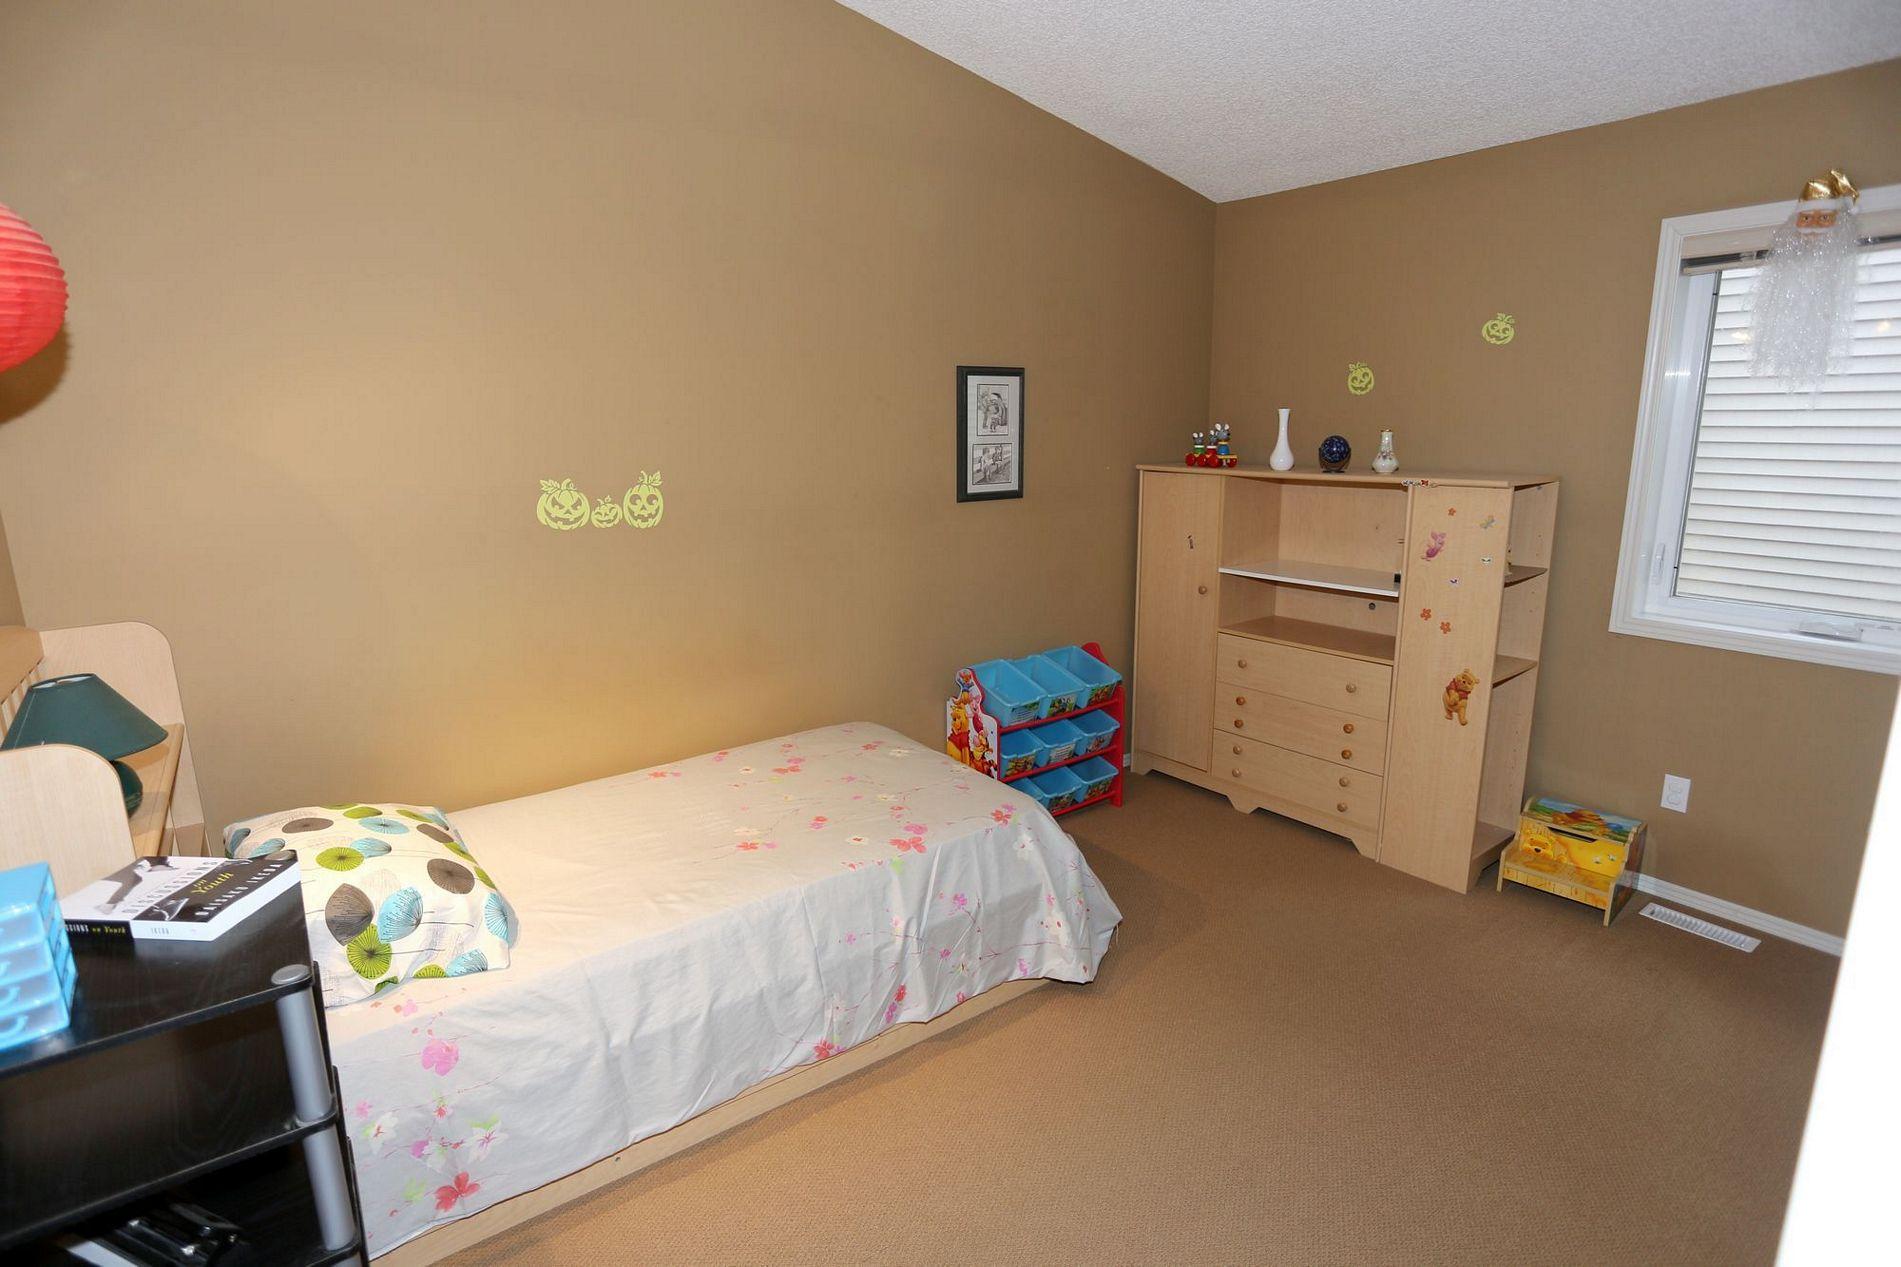 15 Nordstrom Drive, Winnipeg, Manitoba  R3X 0A5 - Photo 12 - 1524618